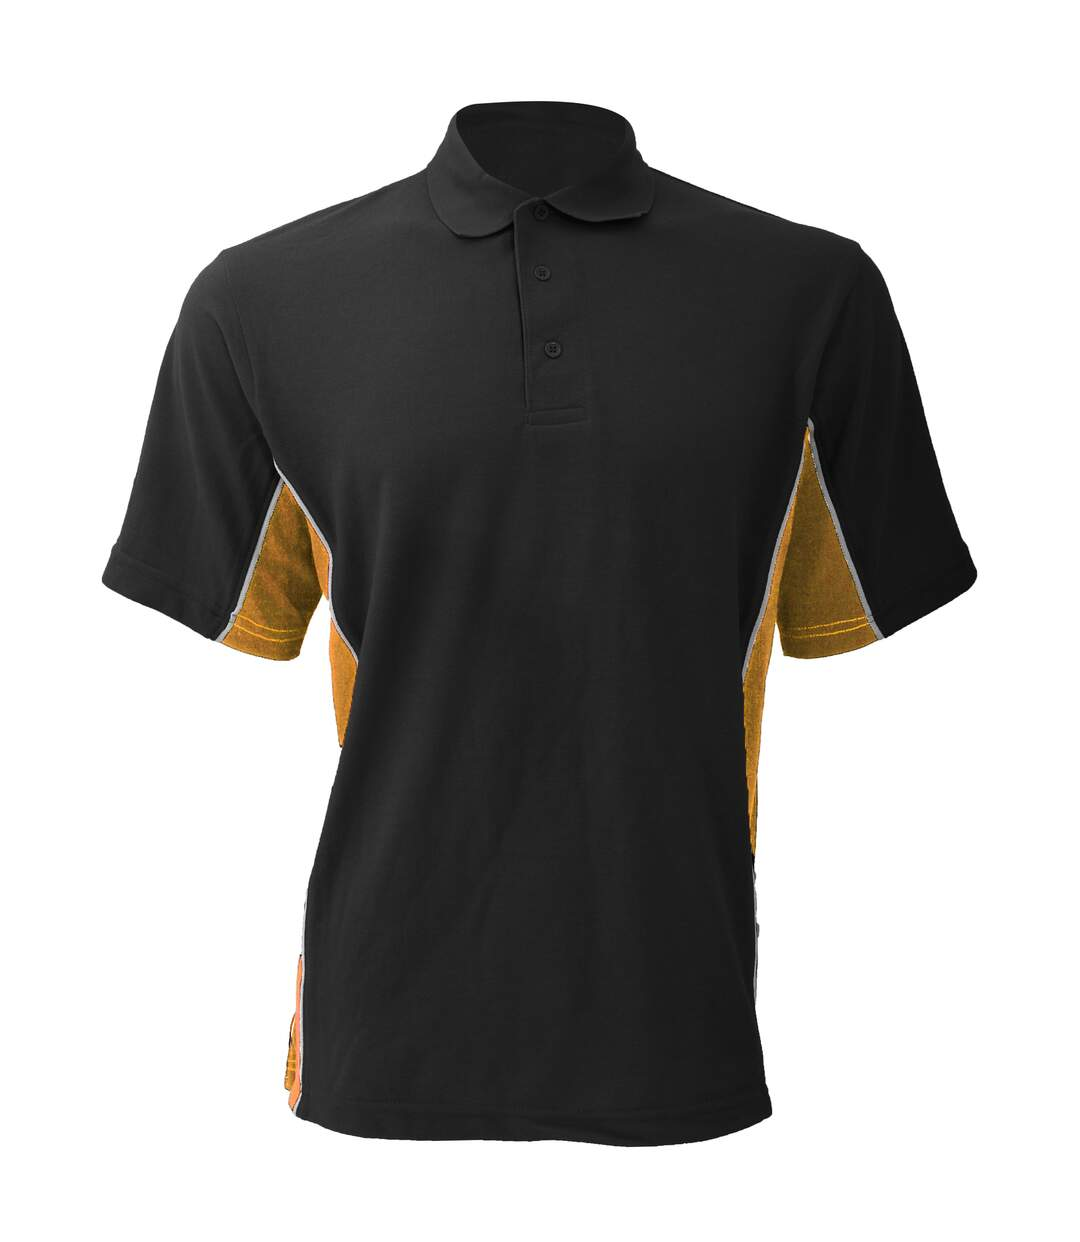 Gamegear® Mens Track Pique Short Sleeve Polo Shirt Top (Black/Gold/White) - UTBC412